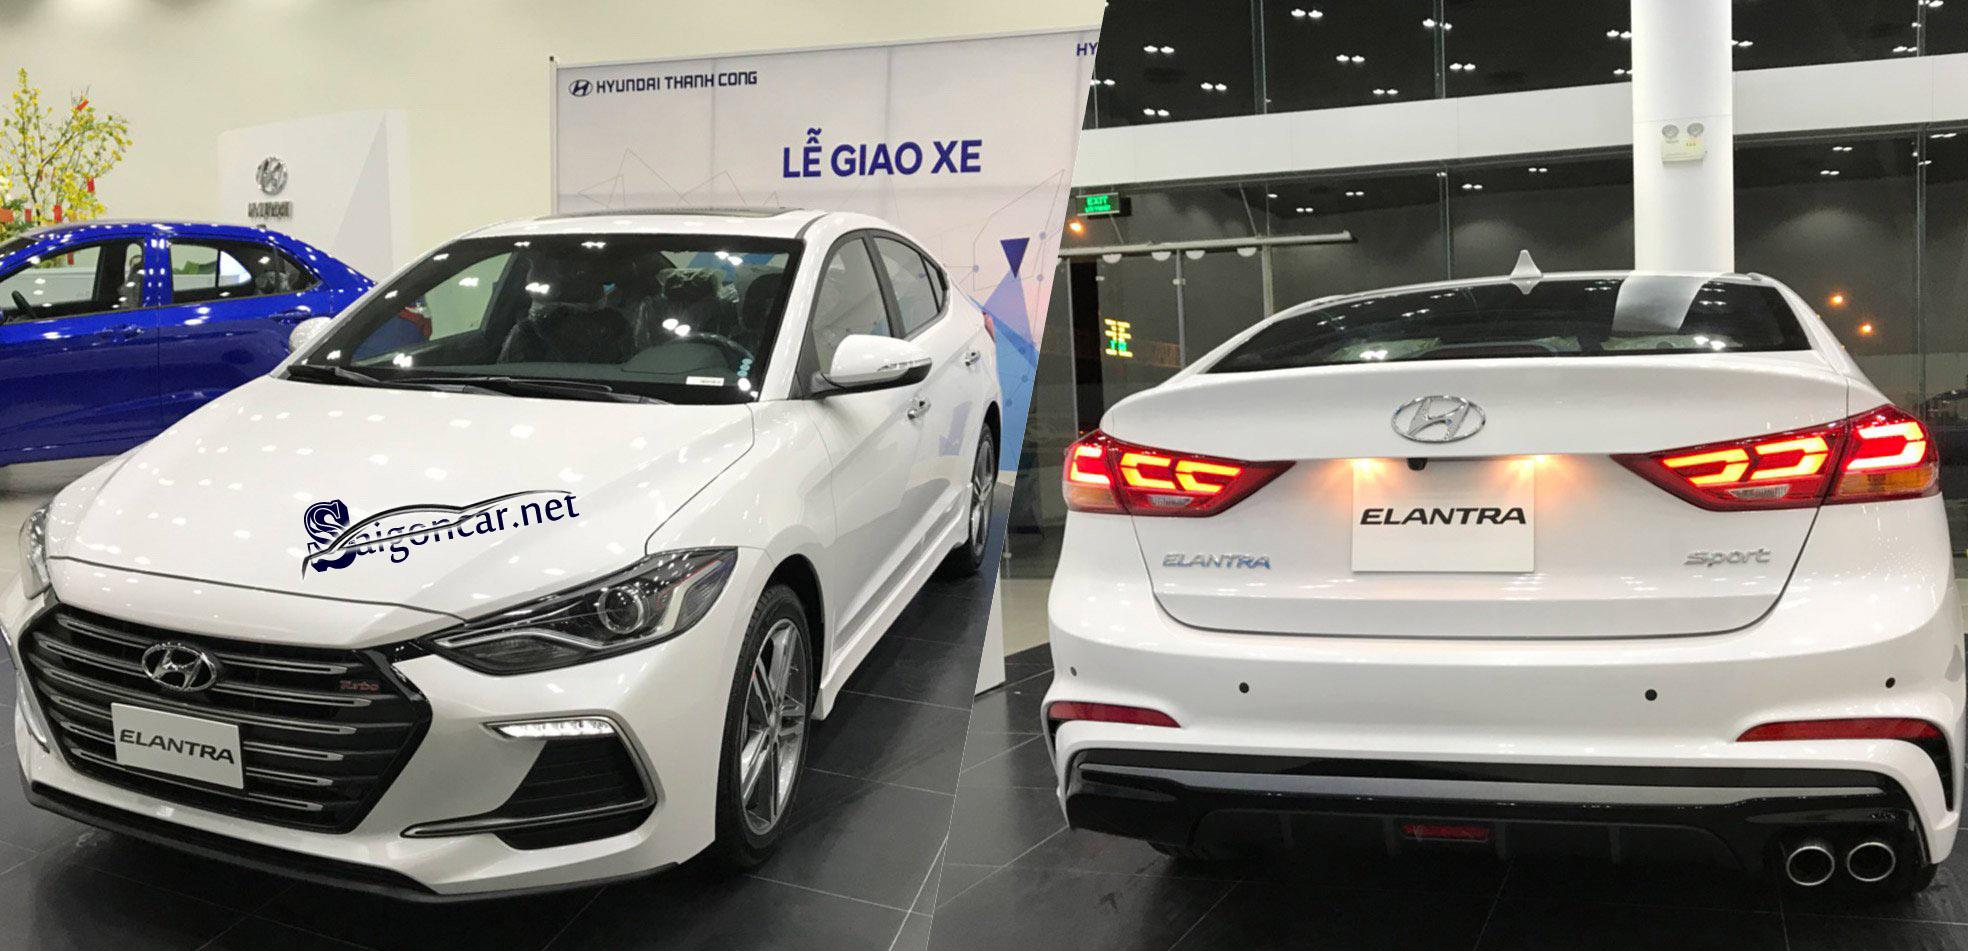 Đánh giá Hyundai Elantra 2019